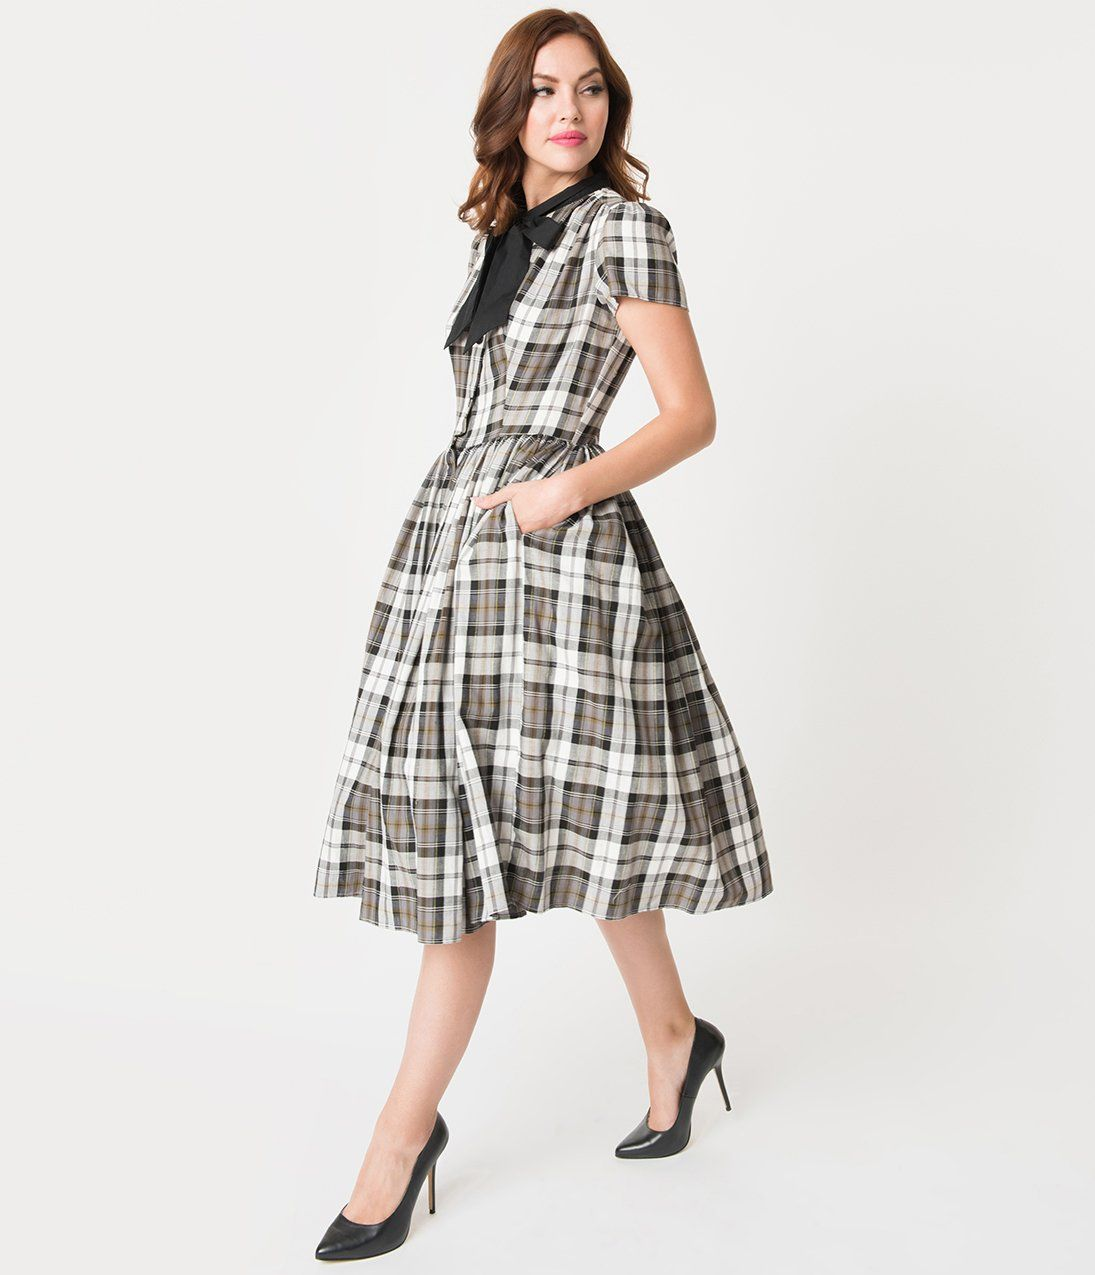 1aa83ca53dc9 Unique Vintage 1950s Style Grey Plaid Button Up Swing Dress